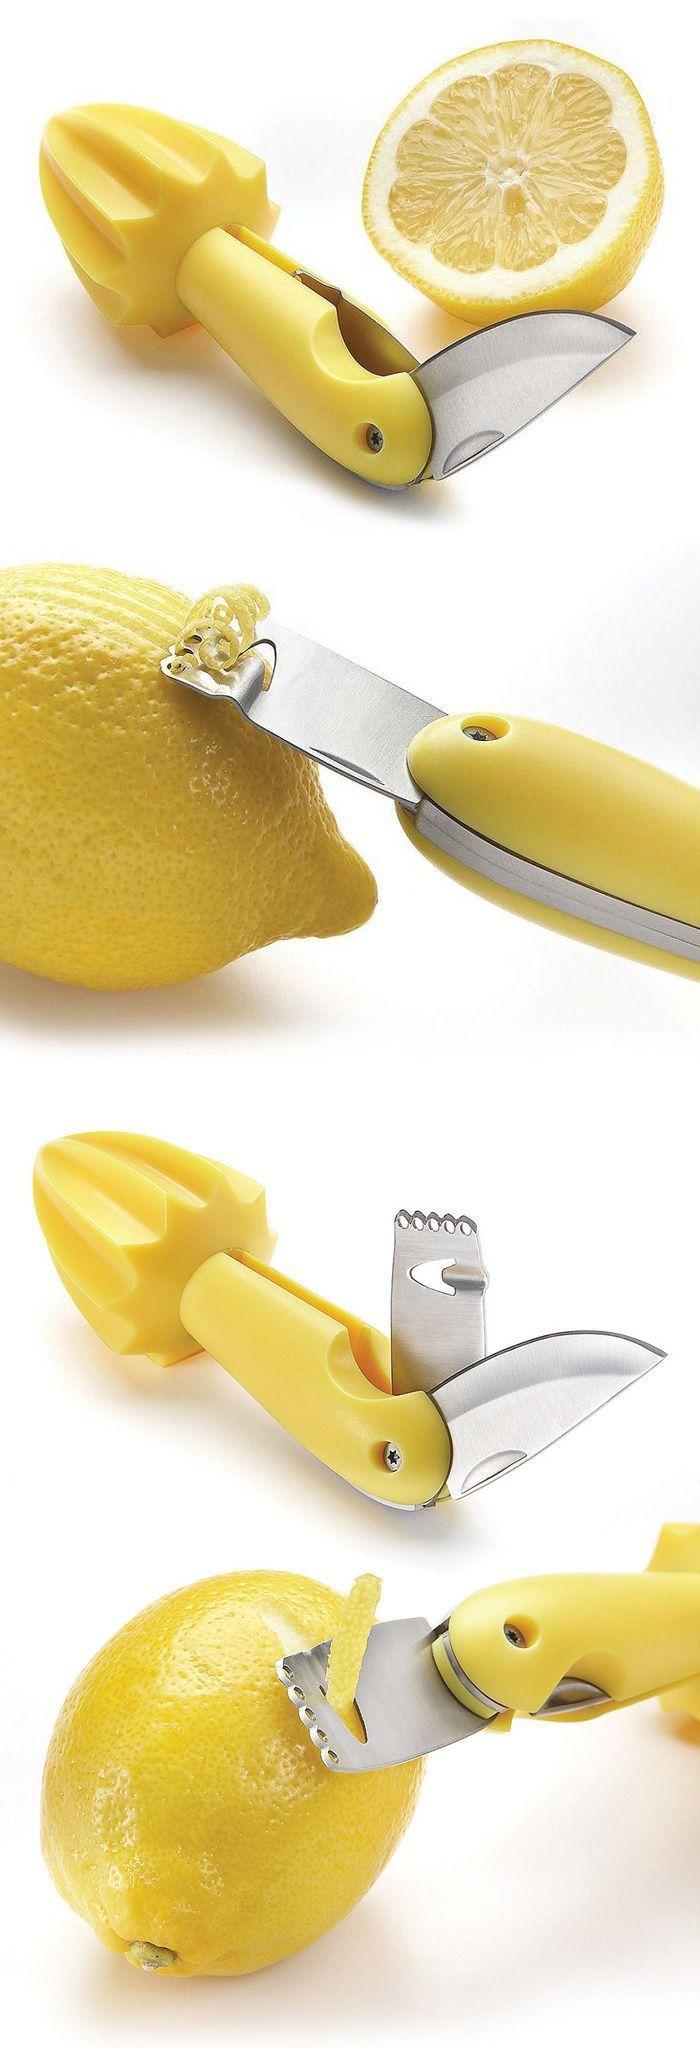 Lemonaid Juicer Reamer | Stainless steel, Steel and Kitchen gadgets